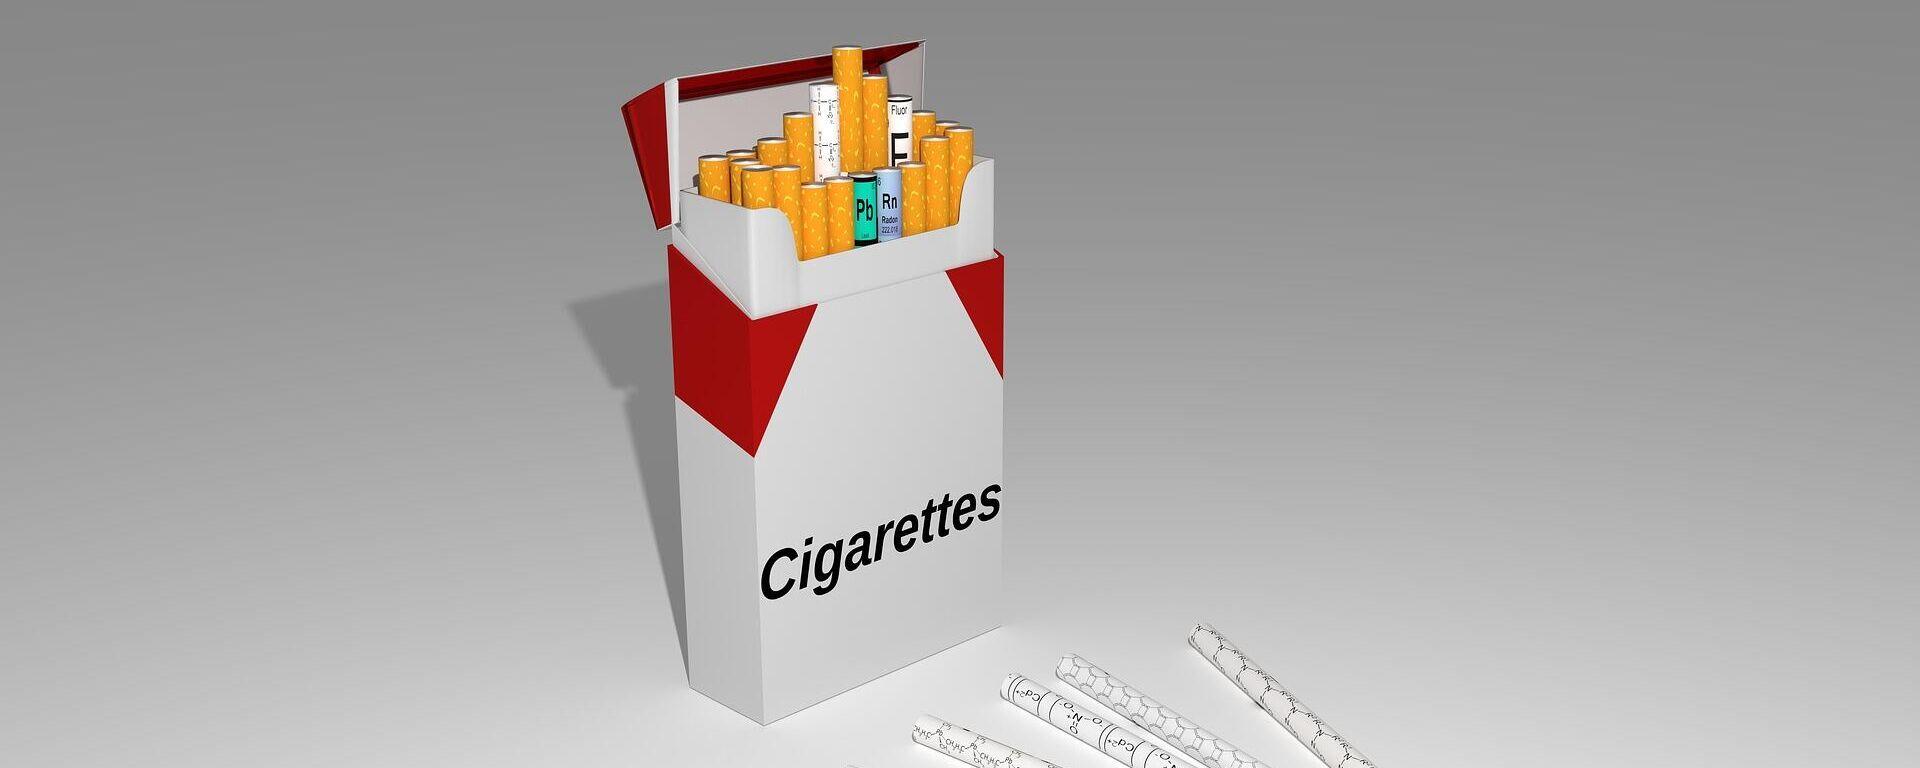 Zigaretten, Symbolbild - SNA, 1920, 30.05.2021